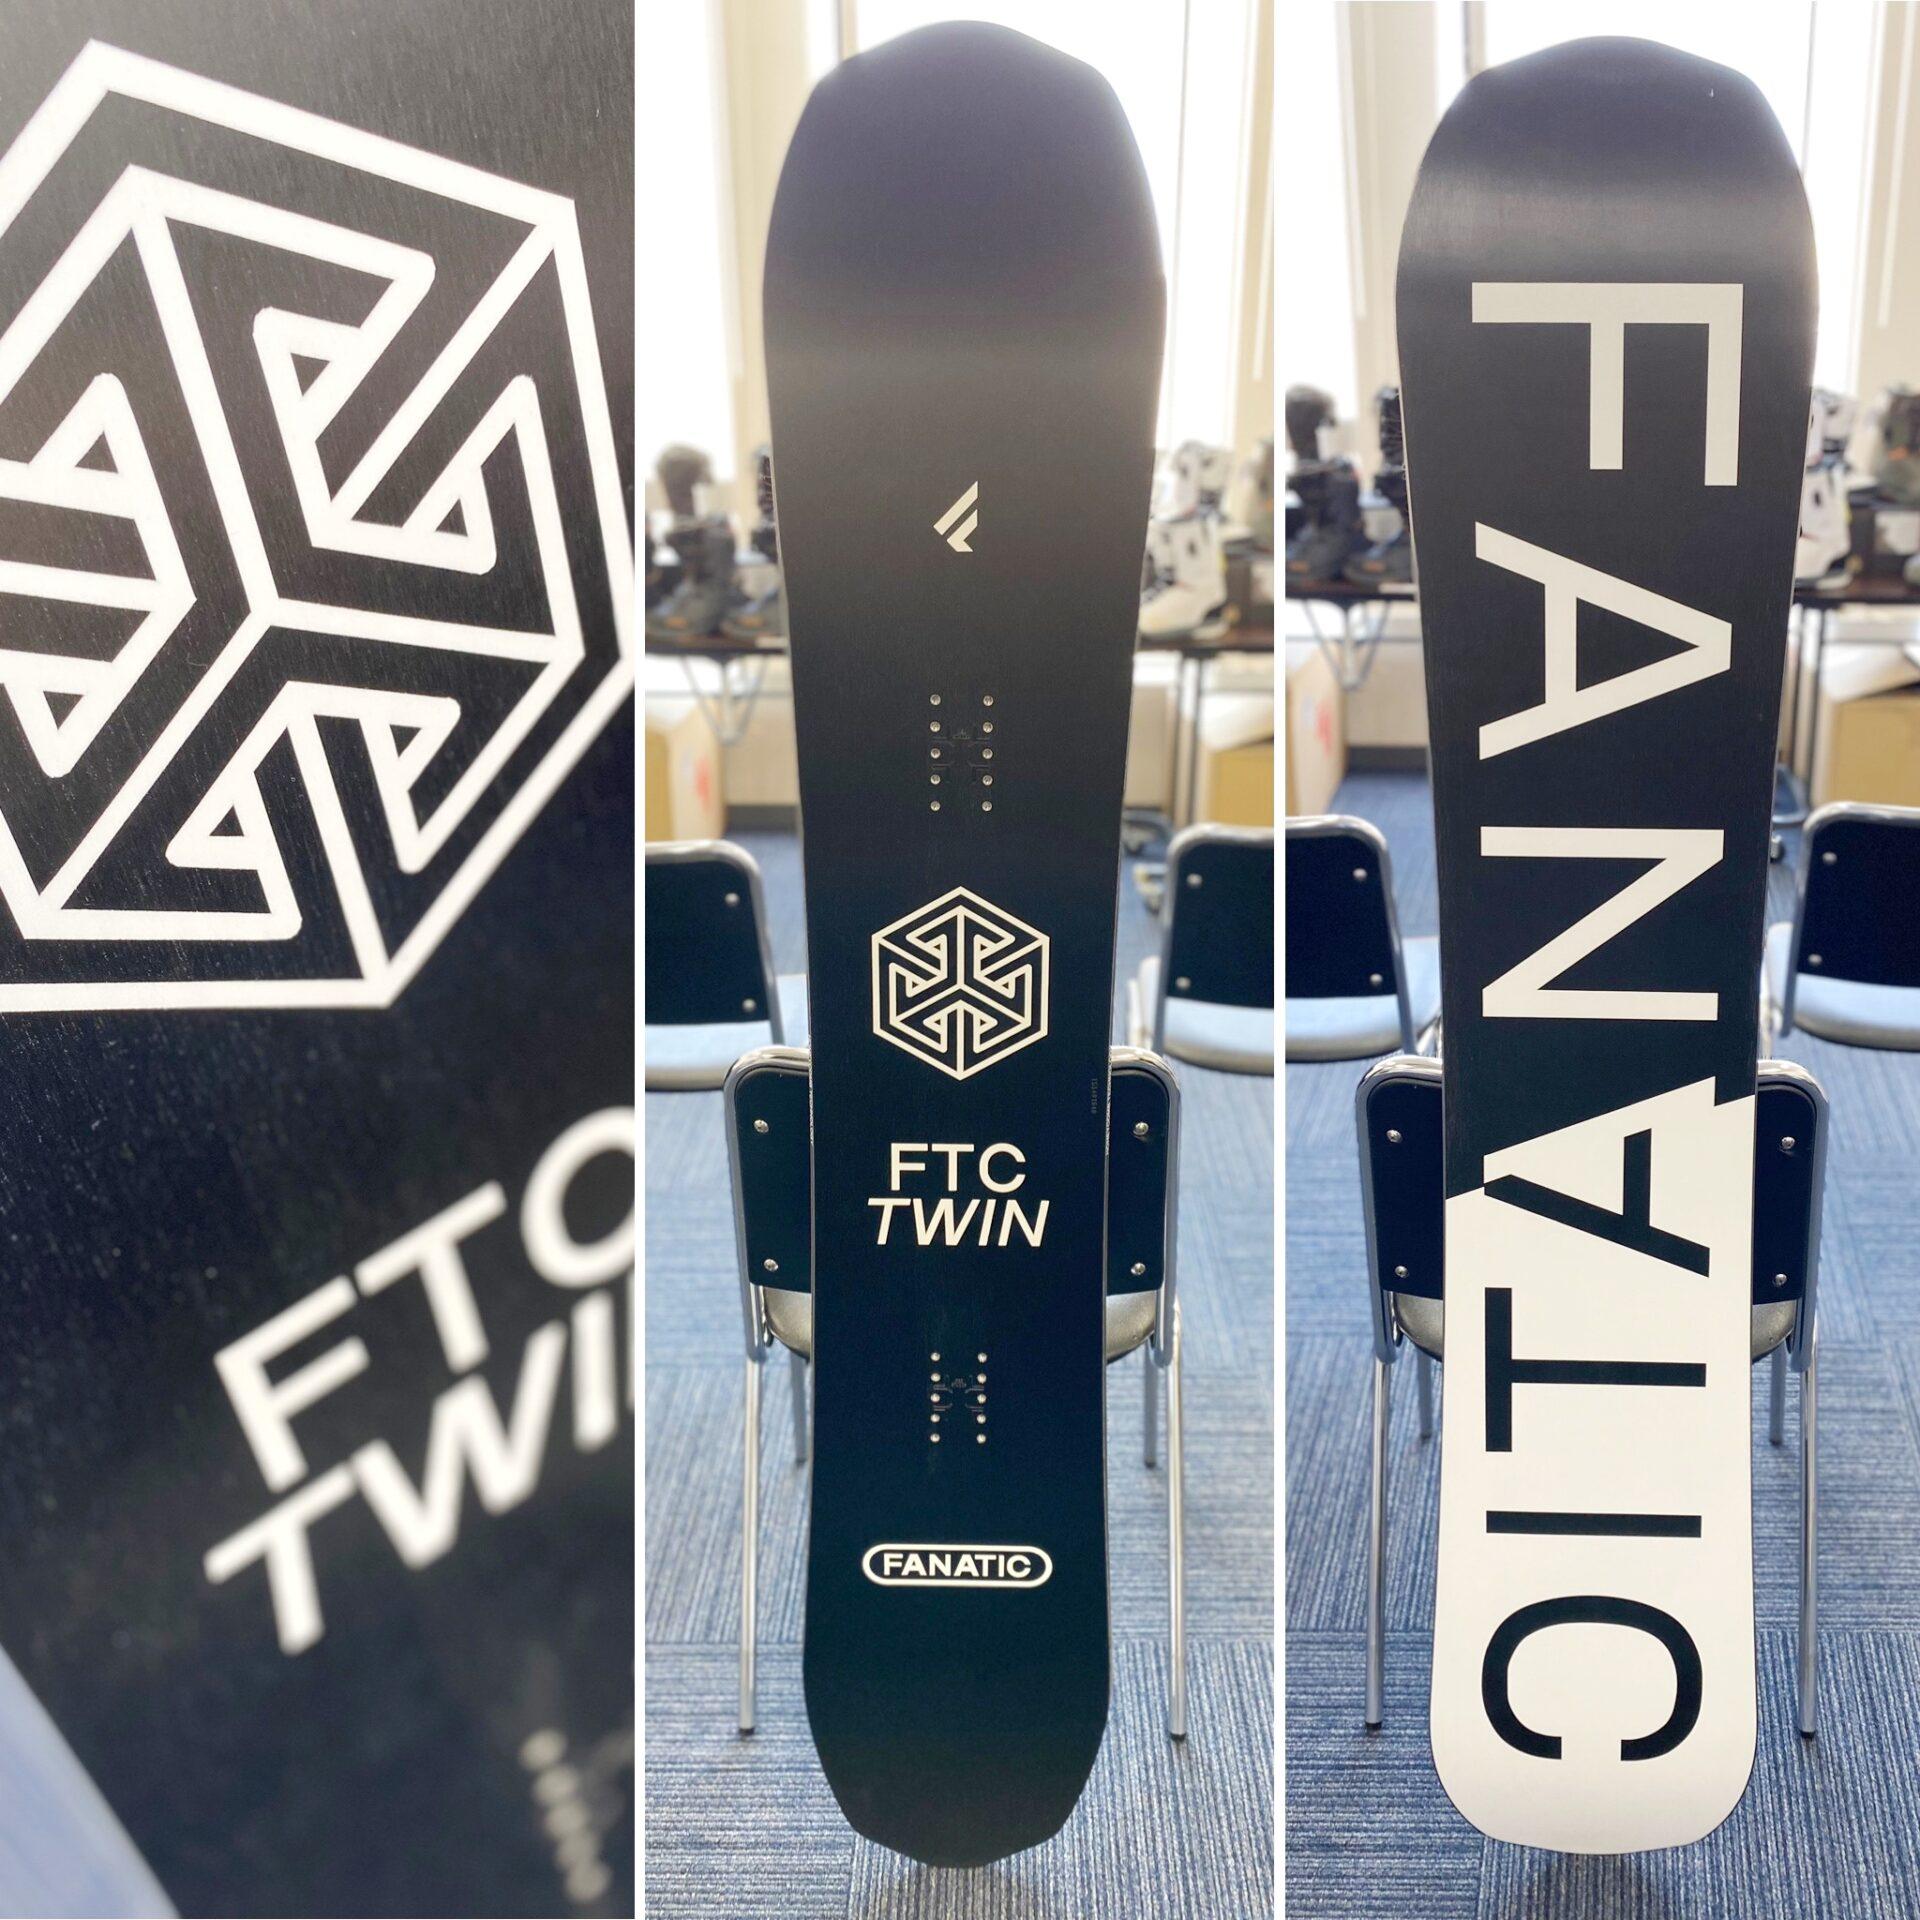 FTC TWIN